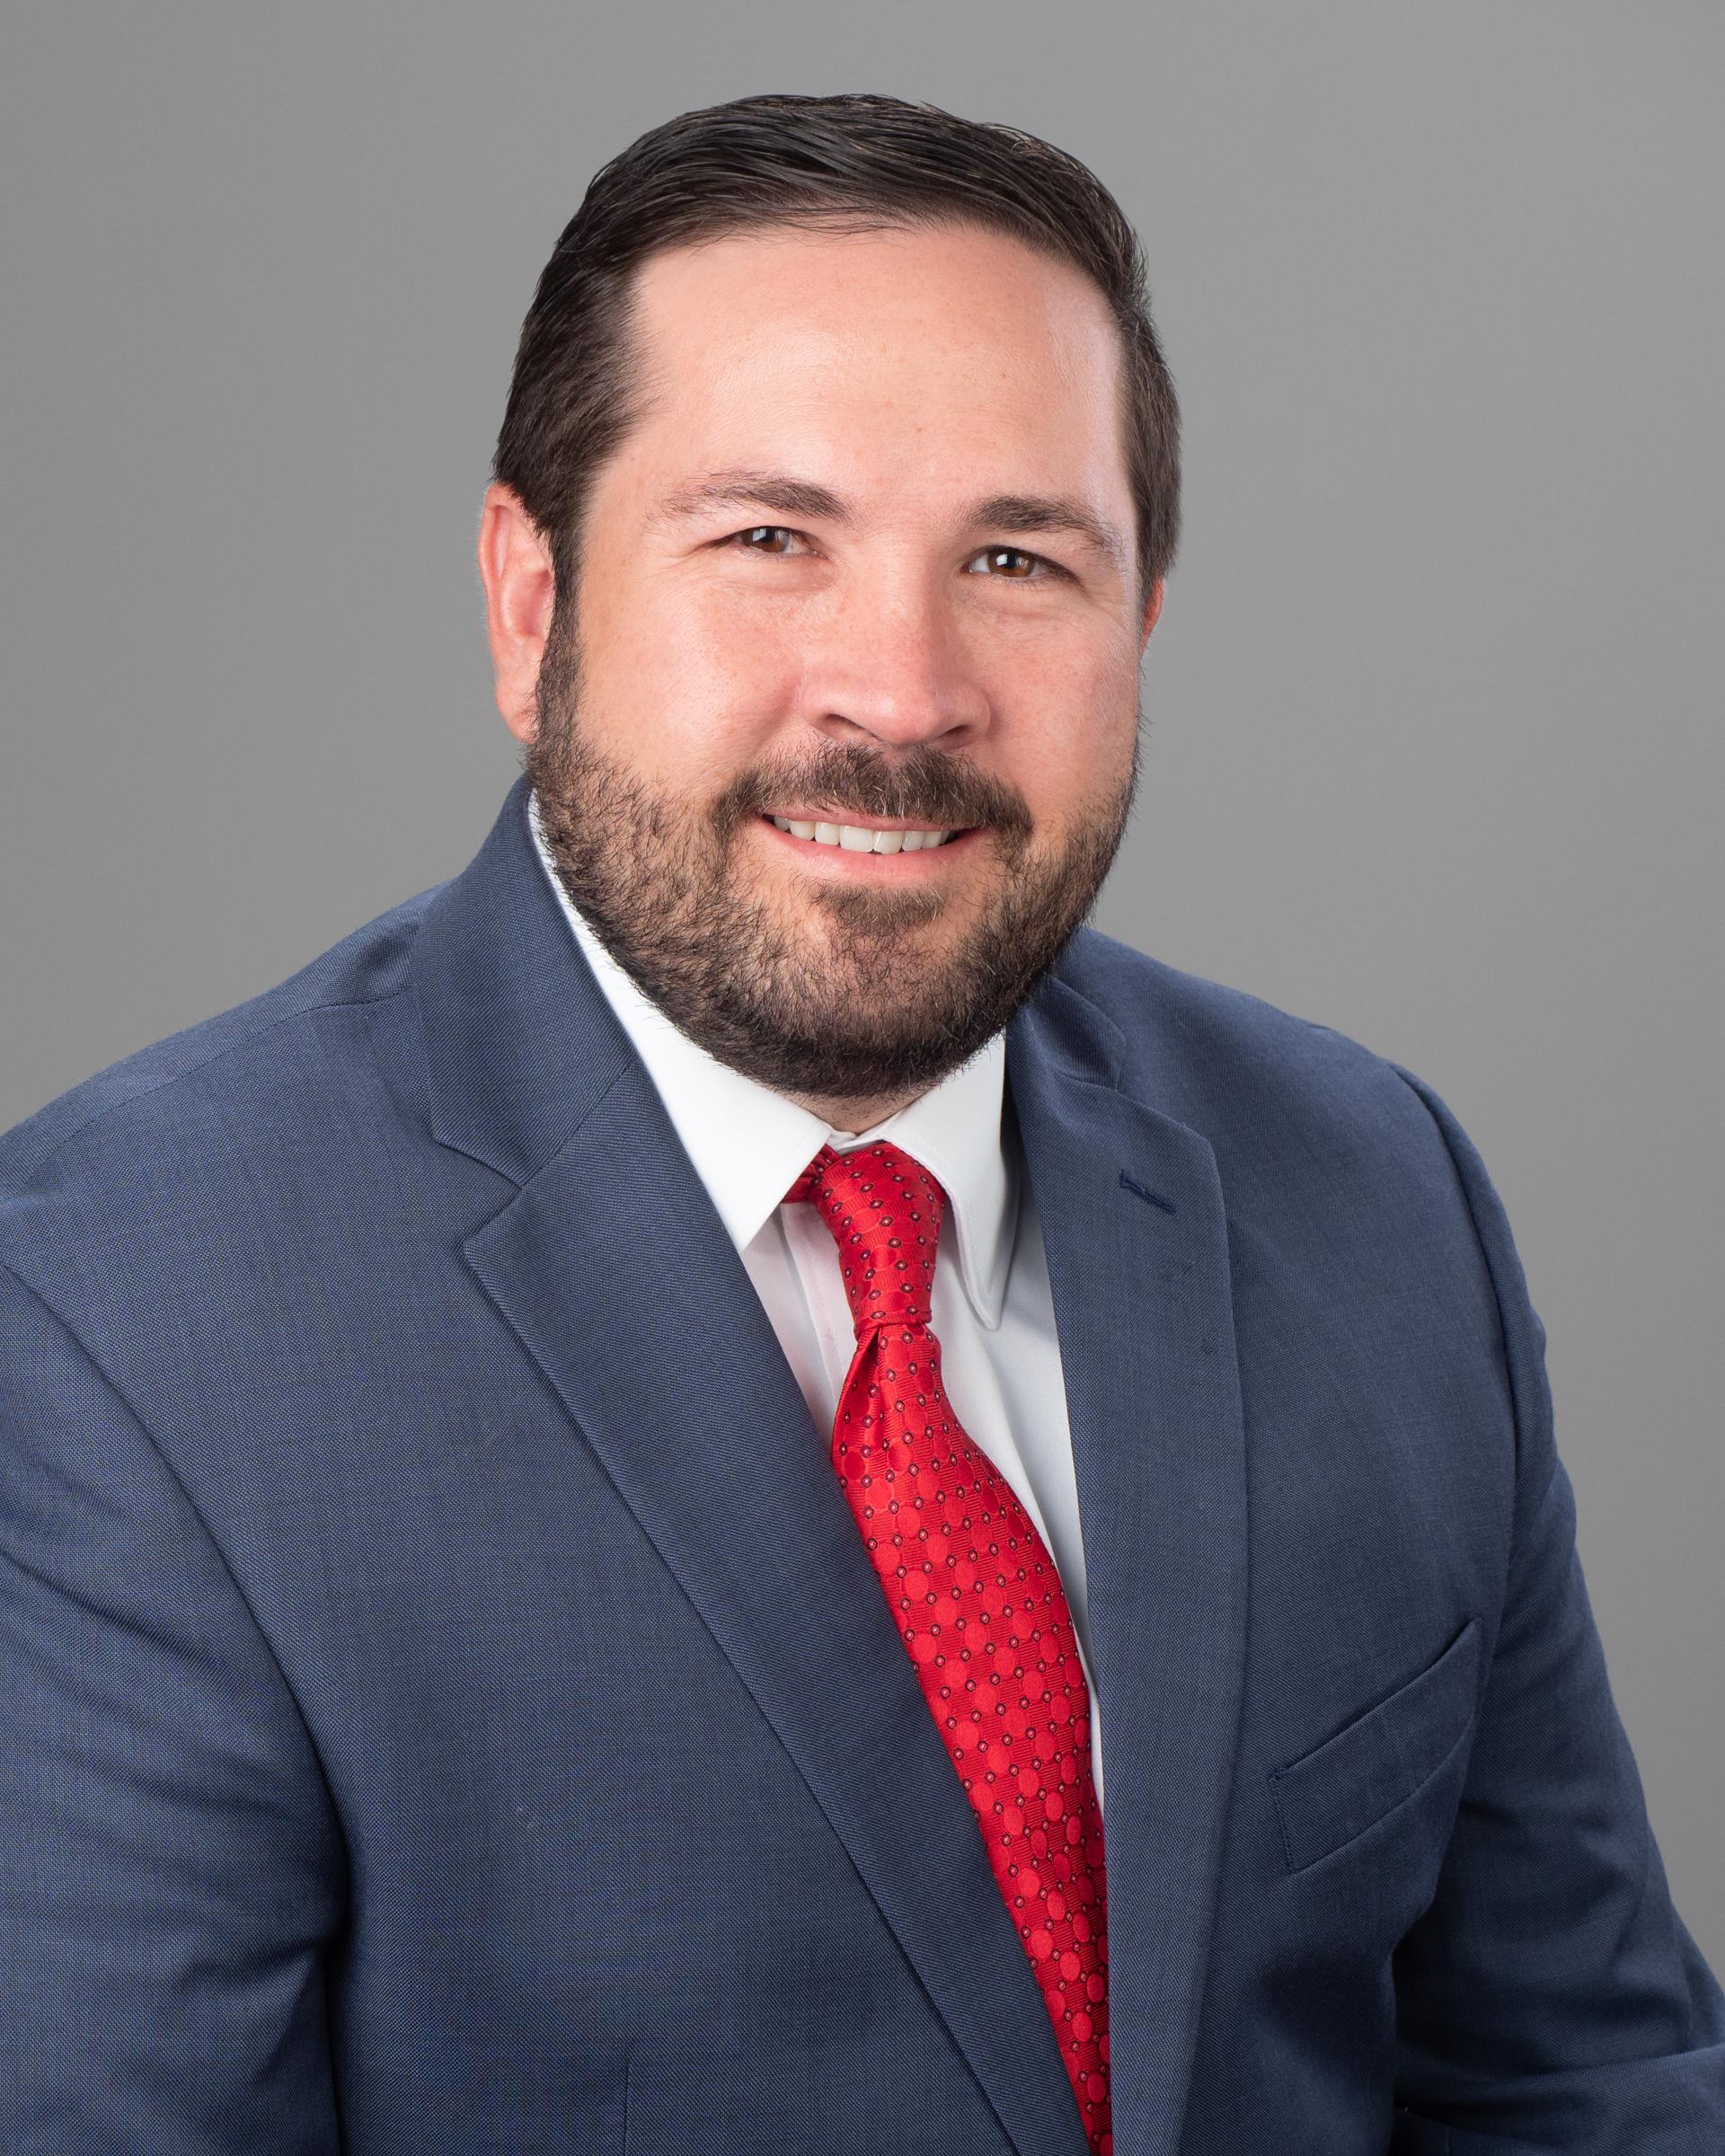 Councilman Ryan Schrift